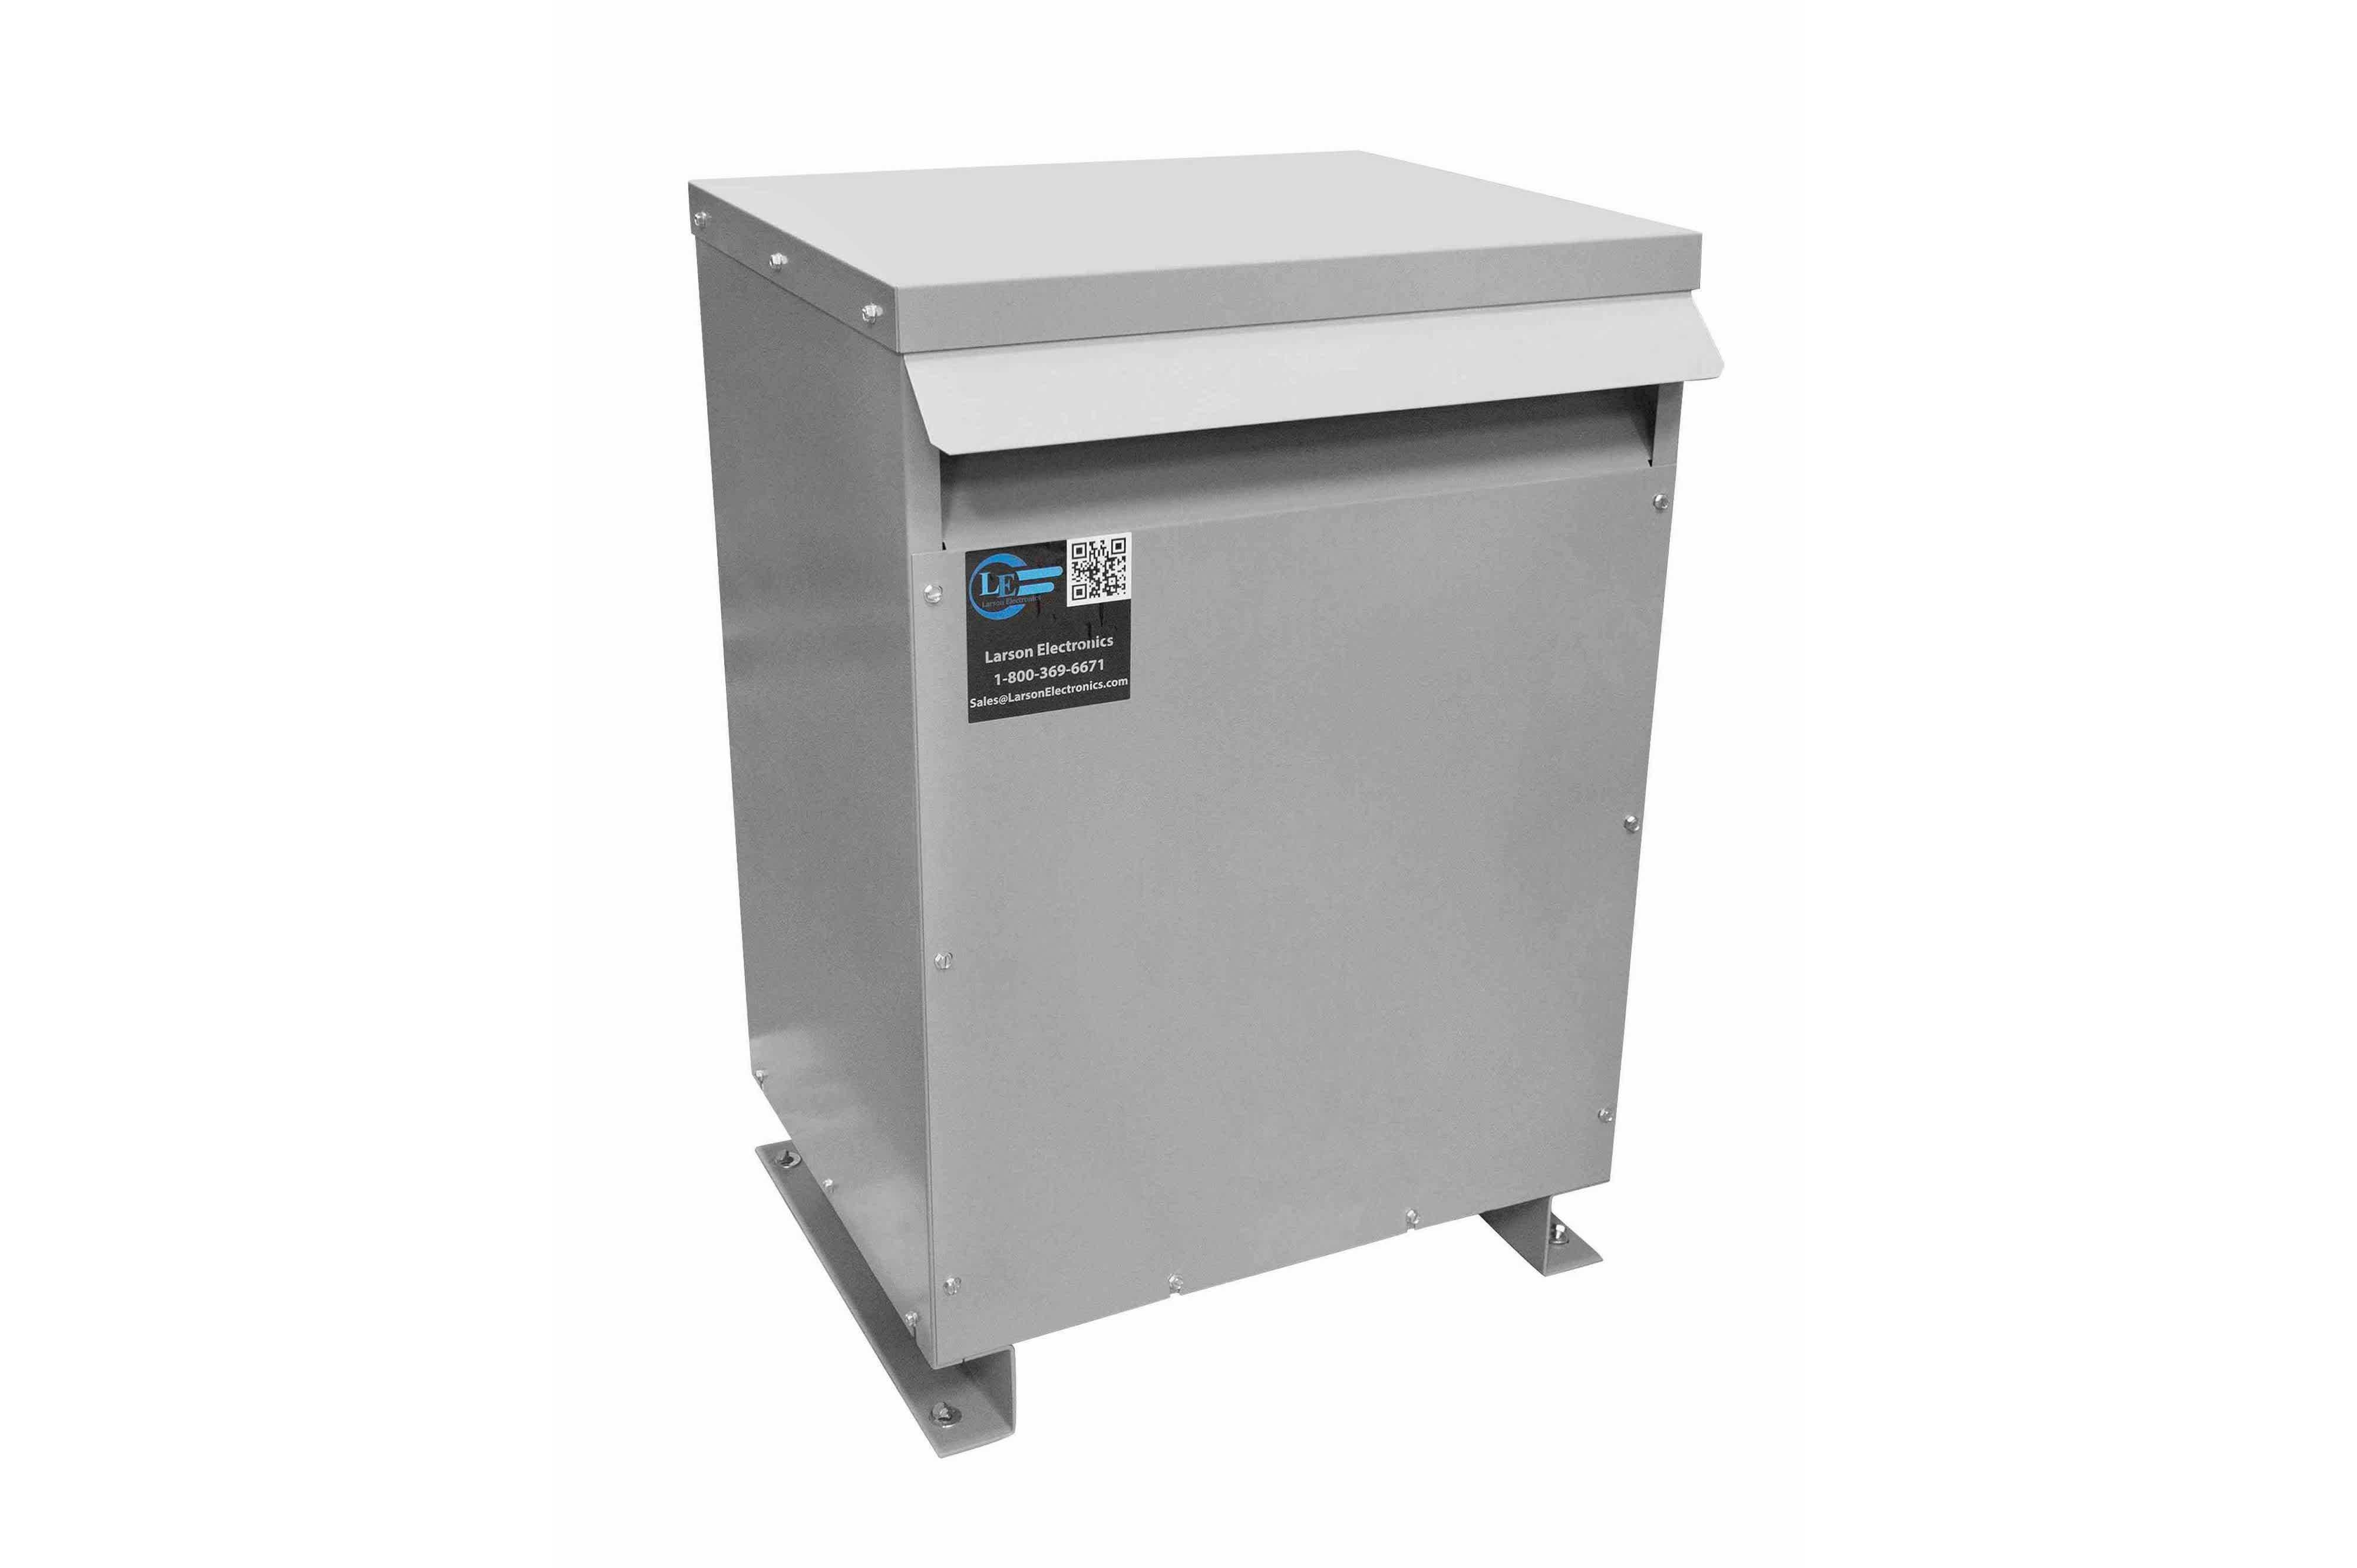 750 kVA 3PH Isolation Transformer, 415V Wye Primary, 600Y/347 Wye-N Secondary, N3R, Ventilated, 60 Hz